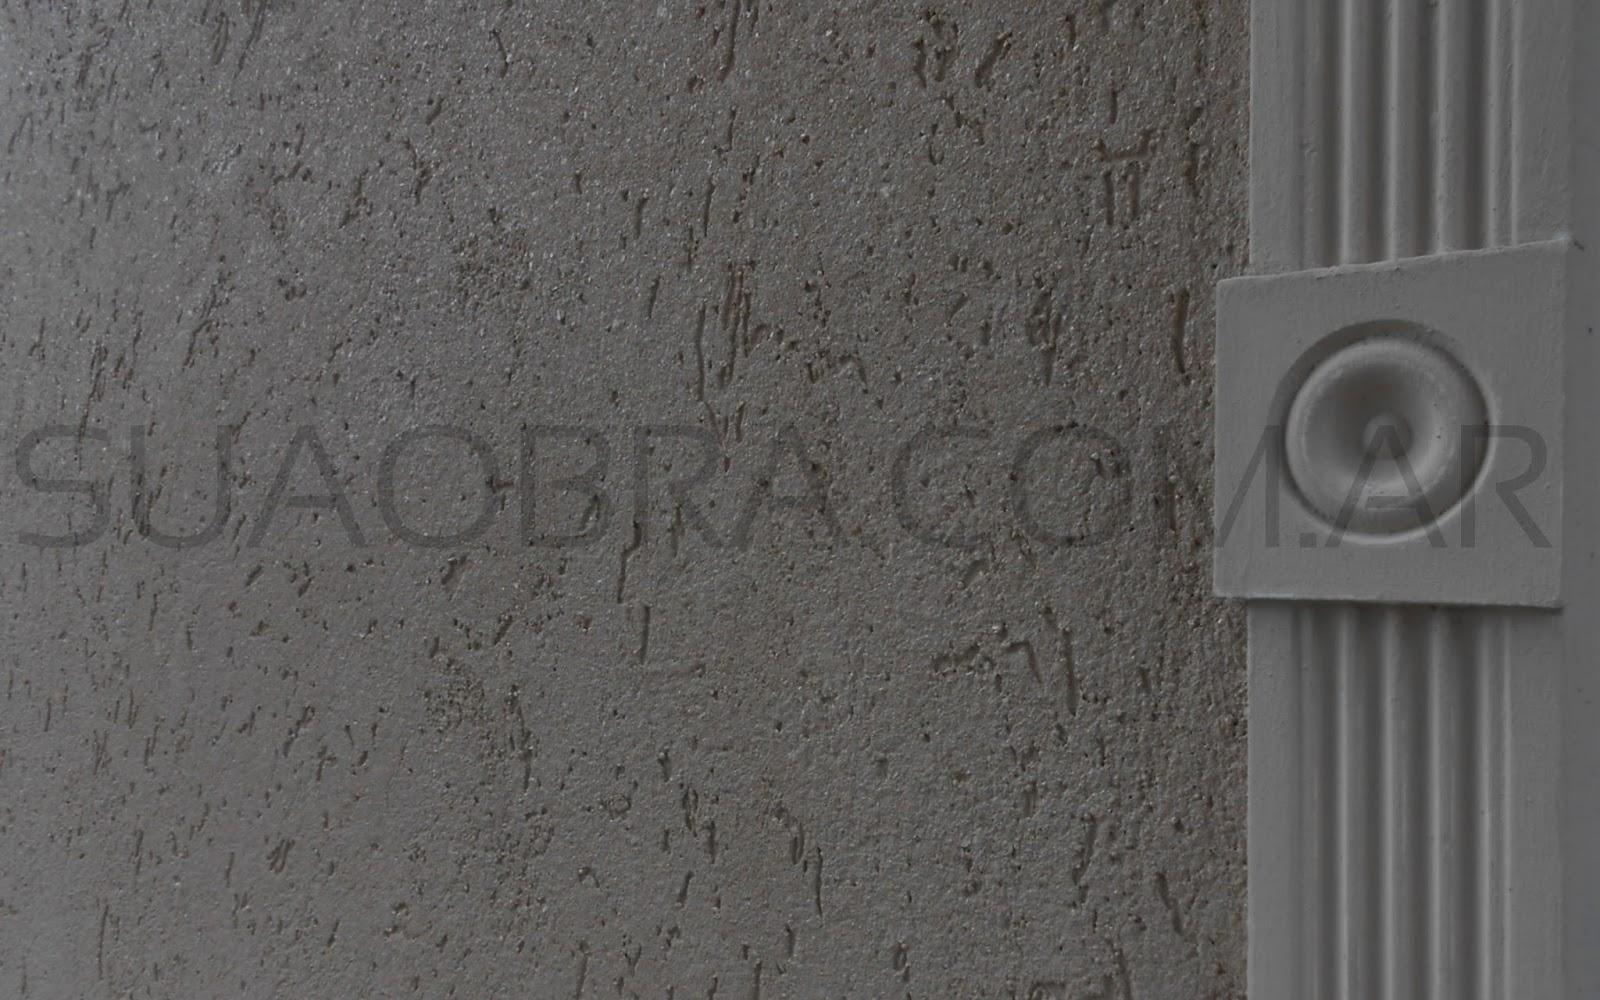 Aplicacion de en paredes limpiar paredes with aplicacion - Aplicacion colores paredes ...